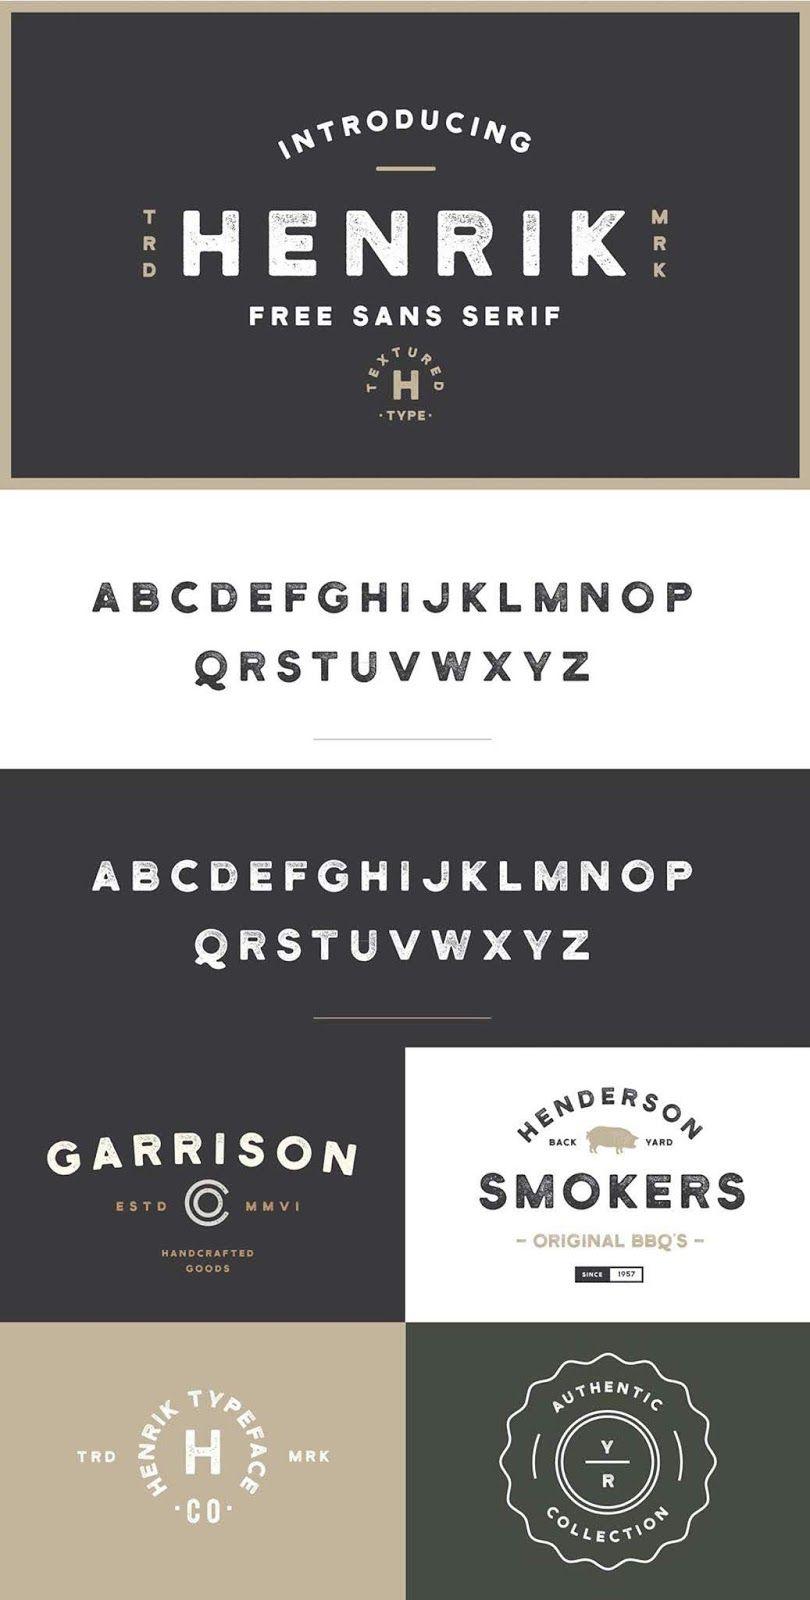 Henrik Sans Serif Font Free Download | Collection Chumbart